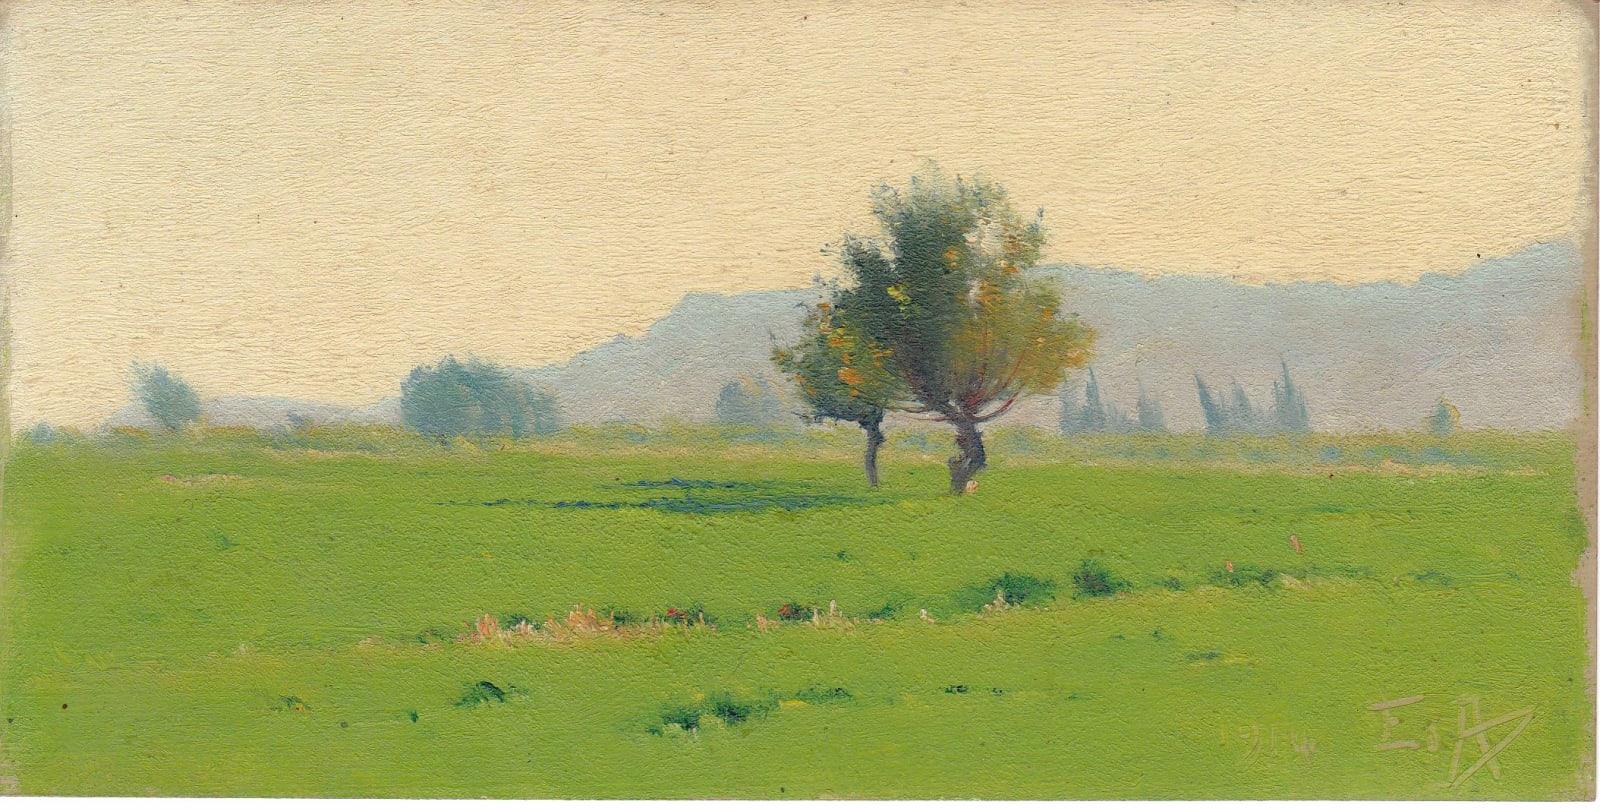 EDOUARD ATHÉNOSY, P-123, 1914